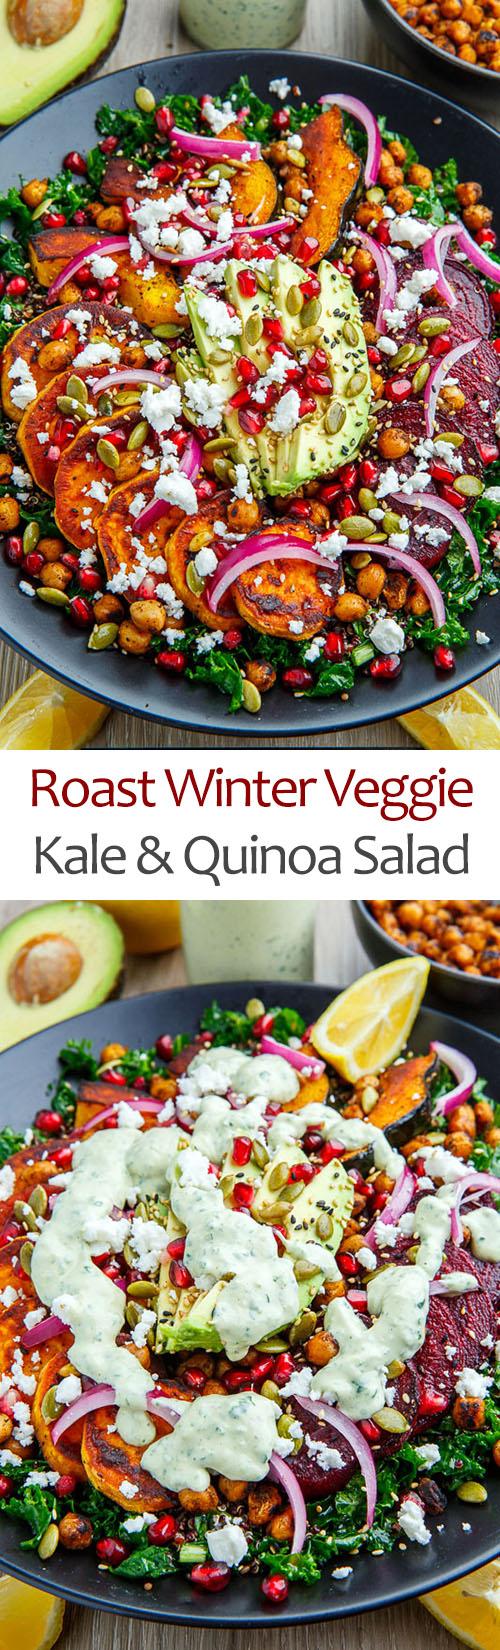 Roast Acorn Squash, Sweet Potato and Beet Kale and Quinoa Salad with Avocado, Feta and Pomegranate in a Cilantro Lemon Tahini Dressing